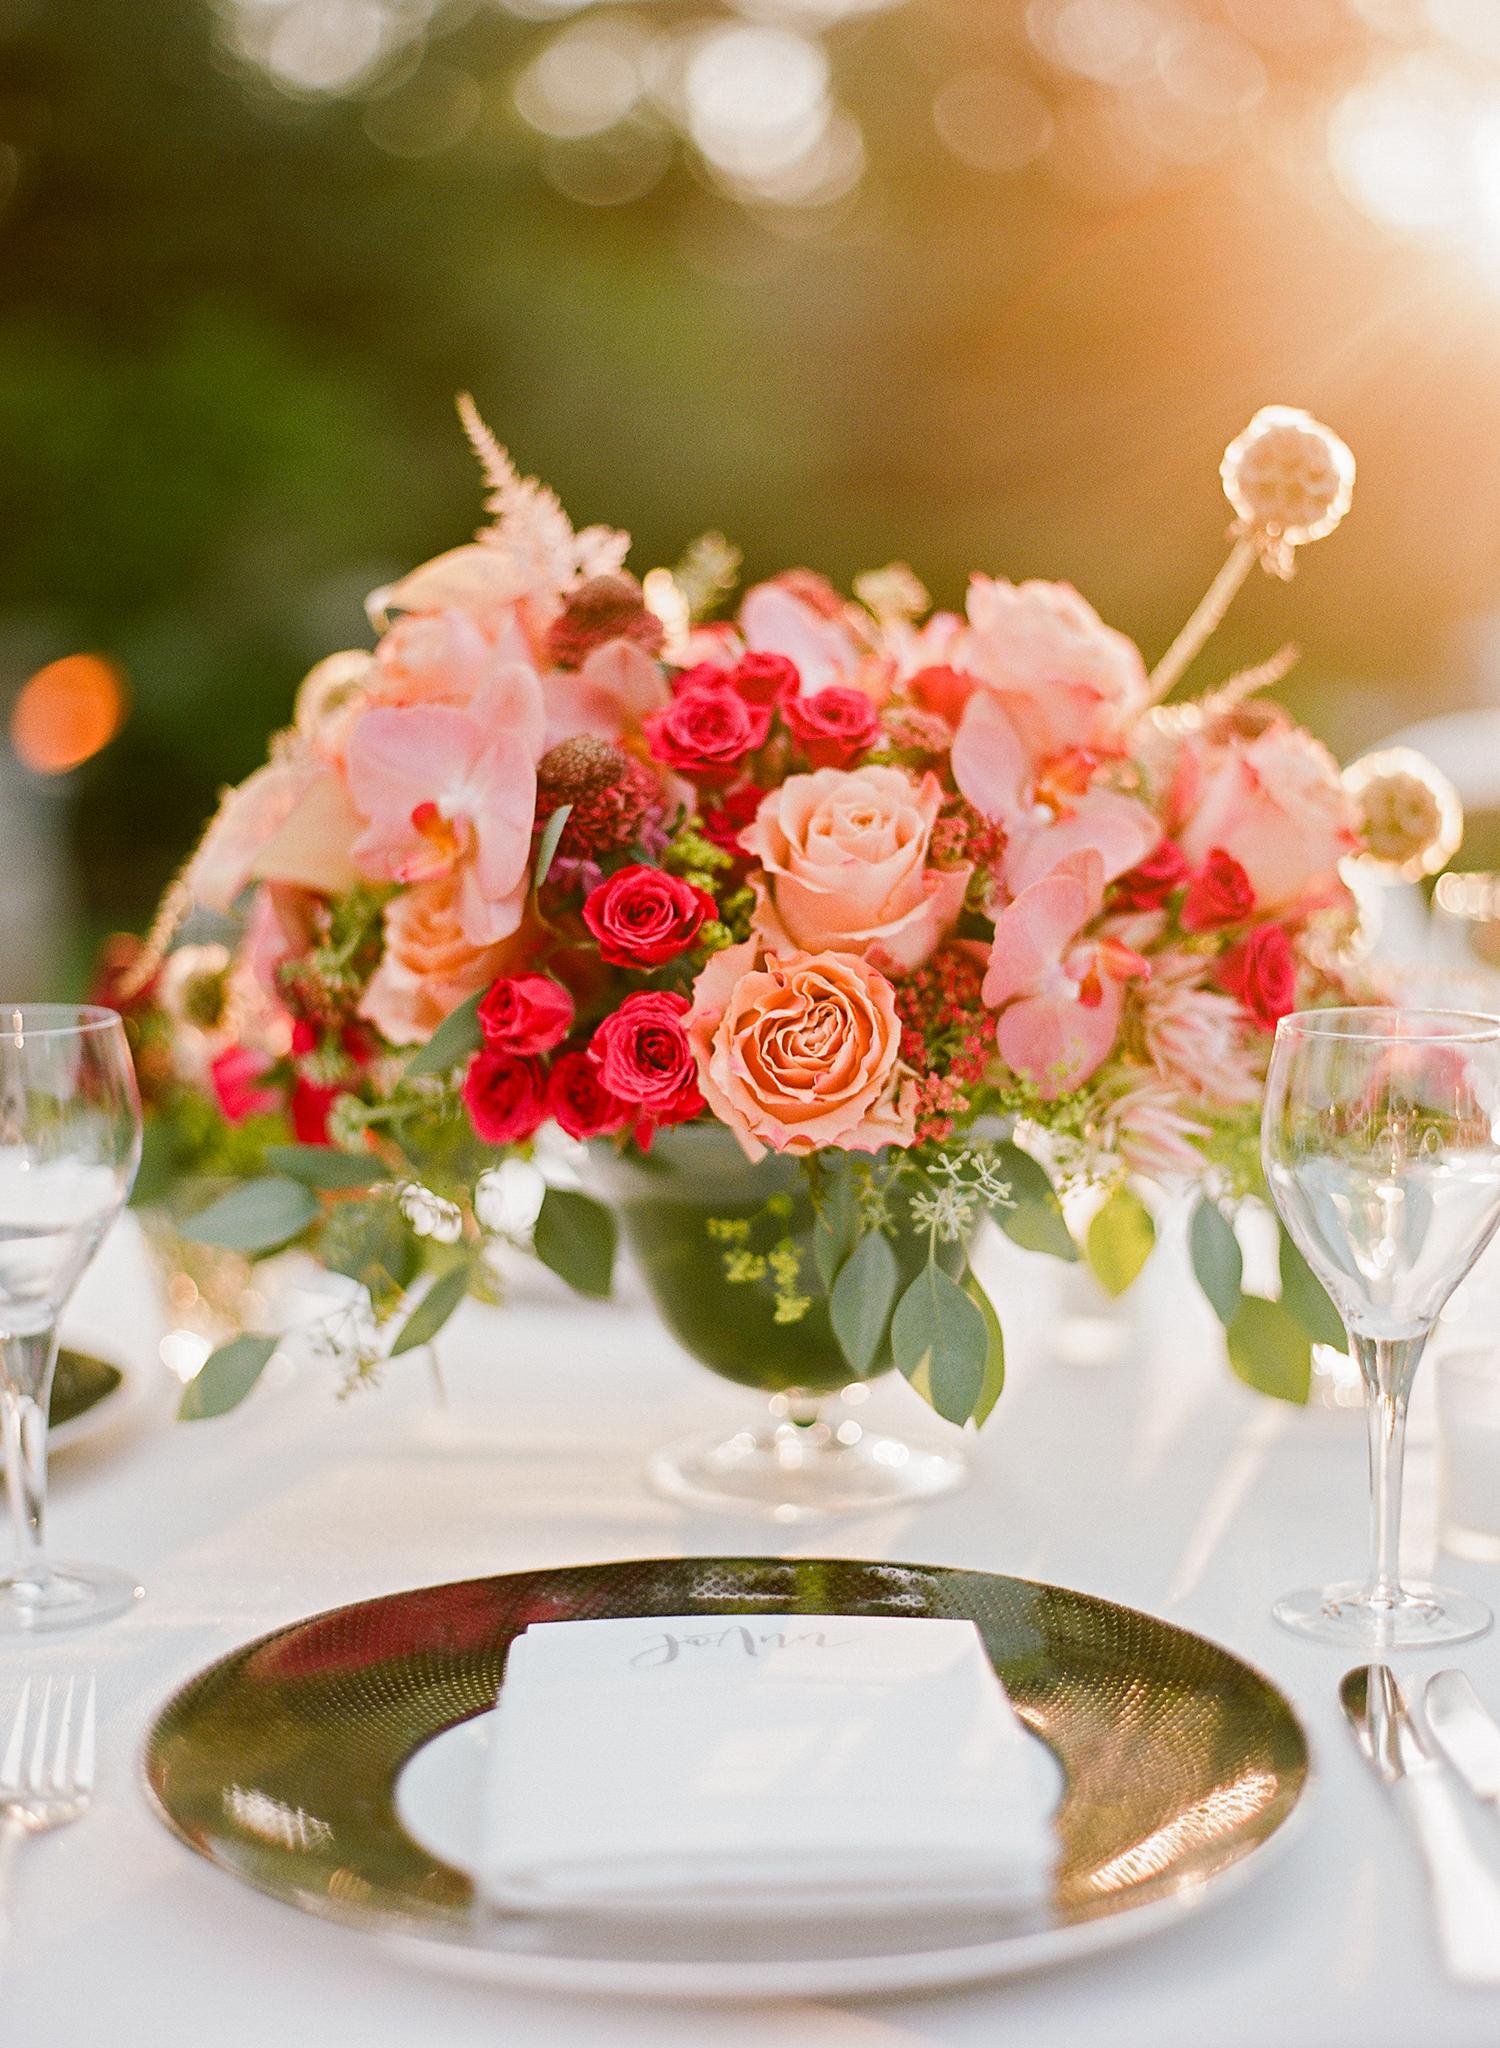 melissa michael pink floral centerpiece